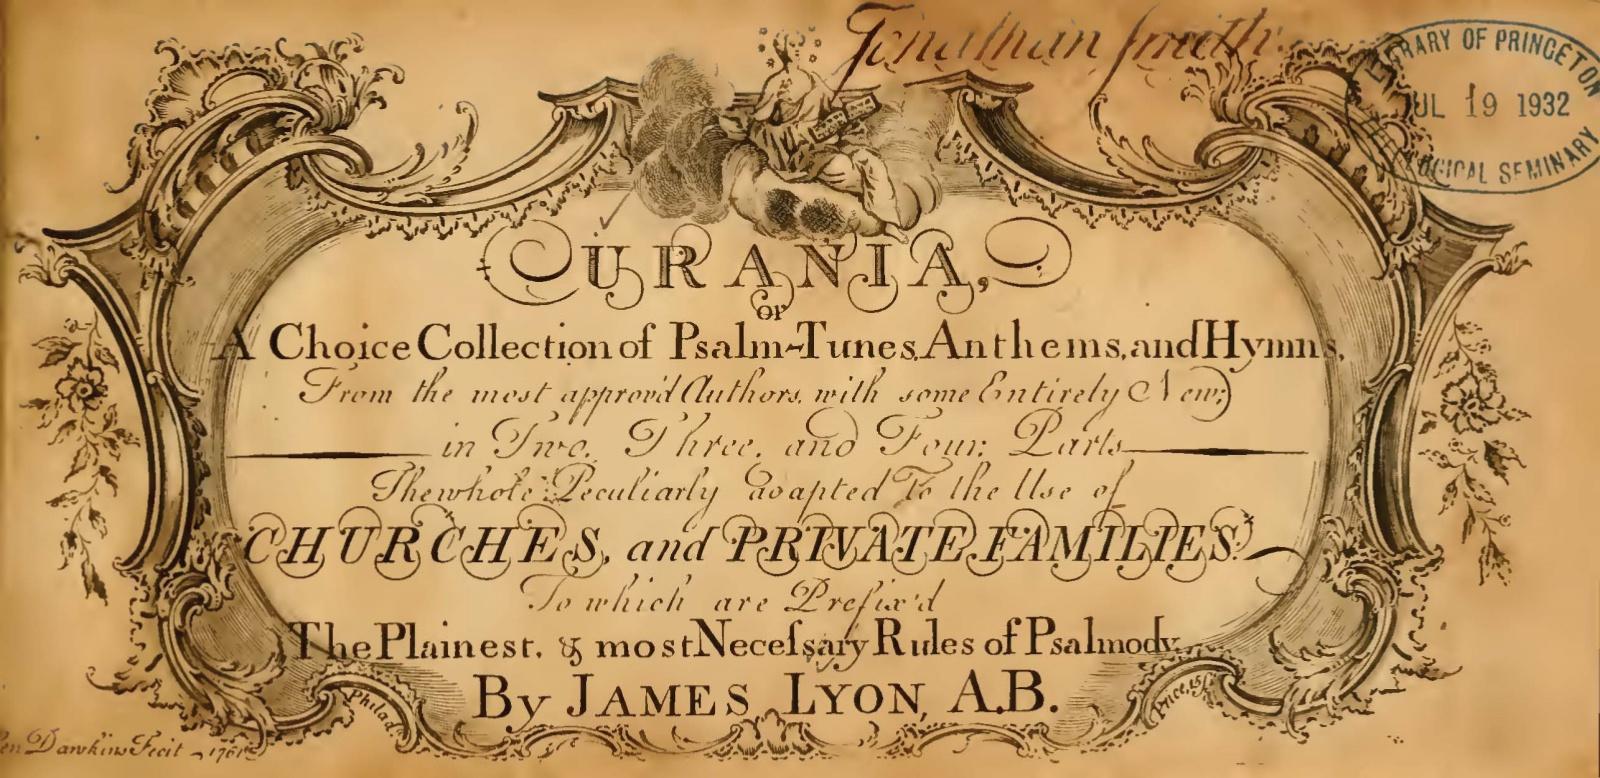 Lyon, James, Urania Title Page.jpg